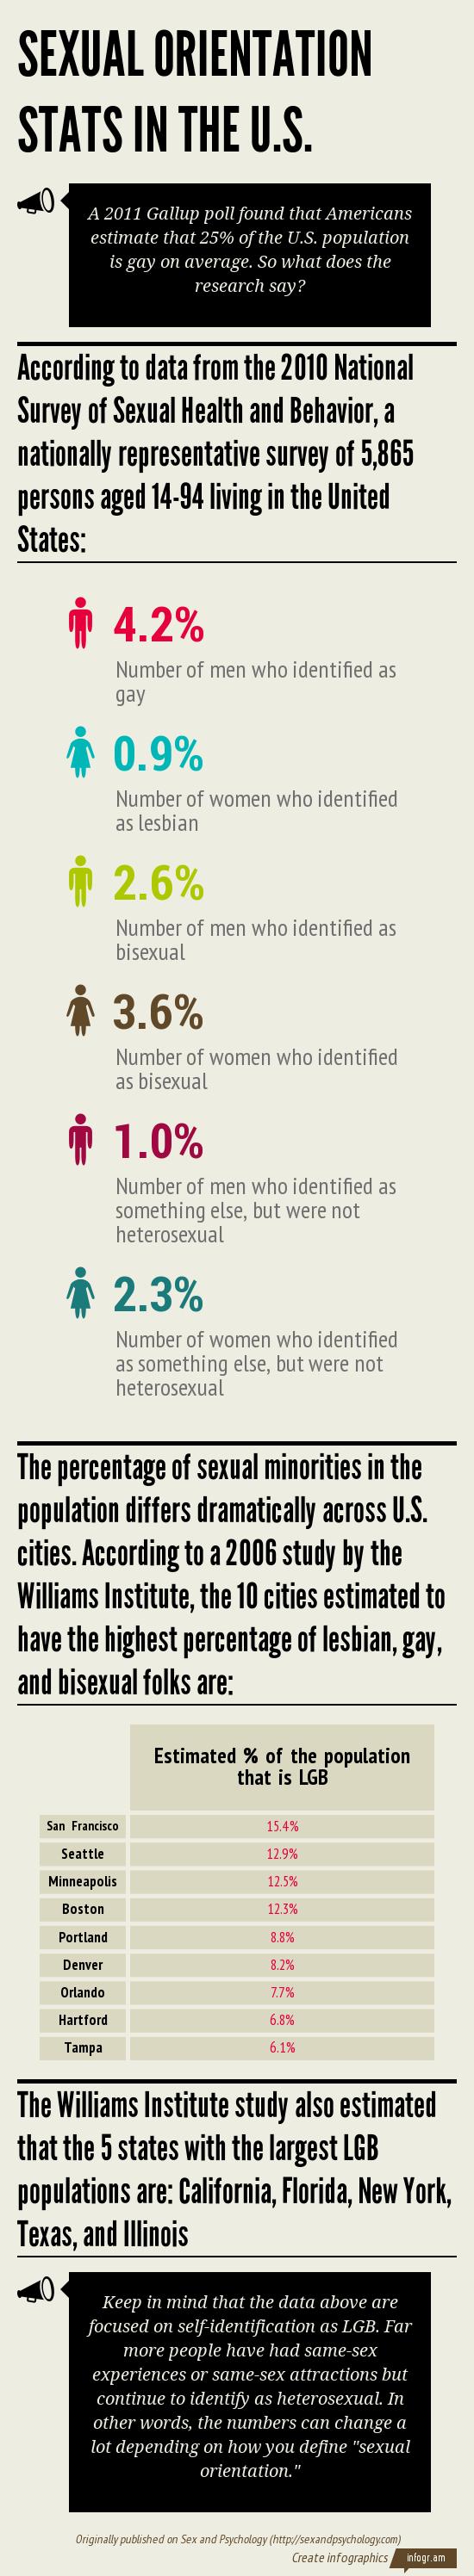 Teen stats on sexual orientation